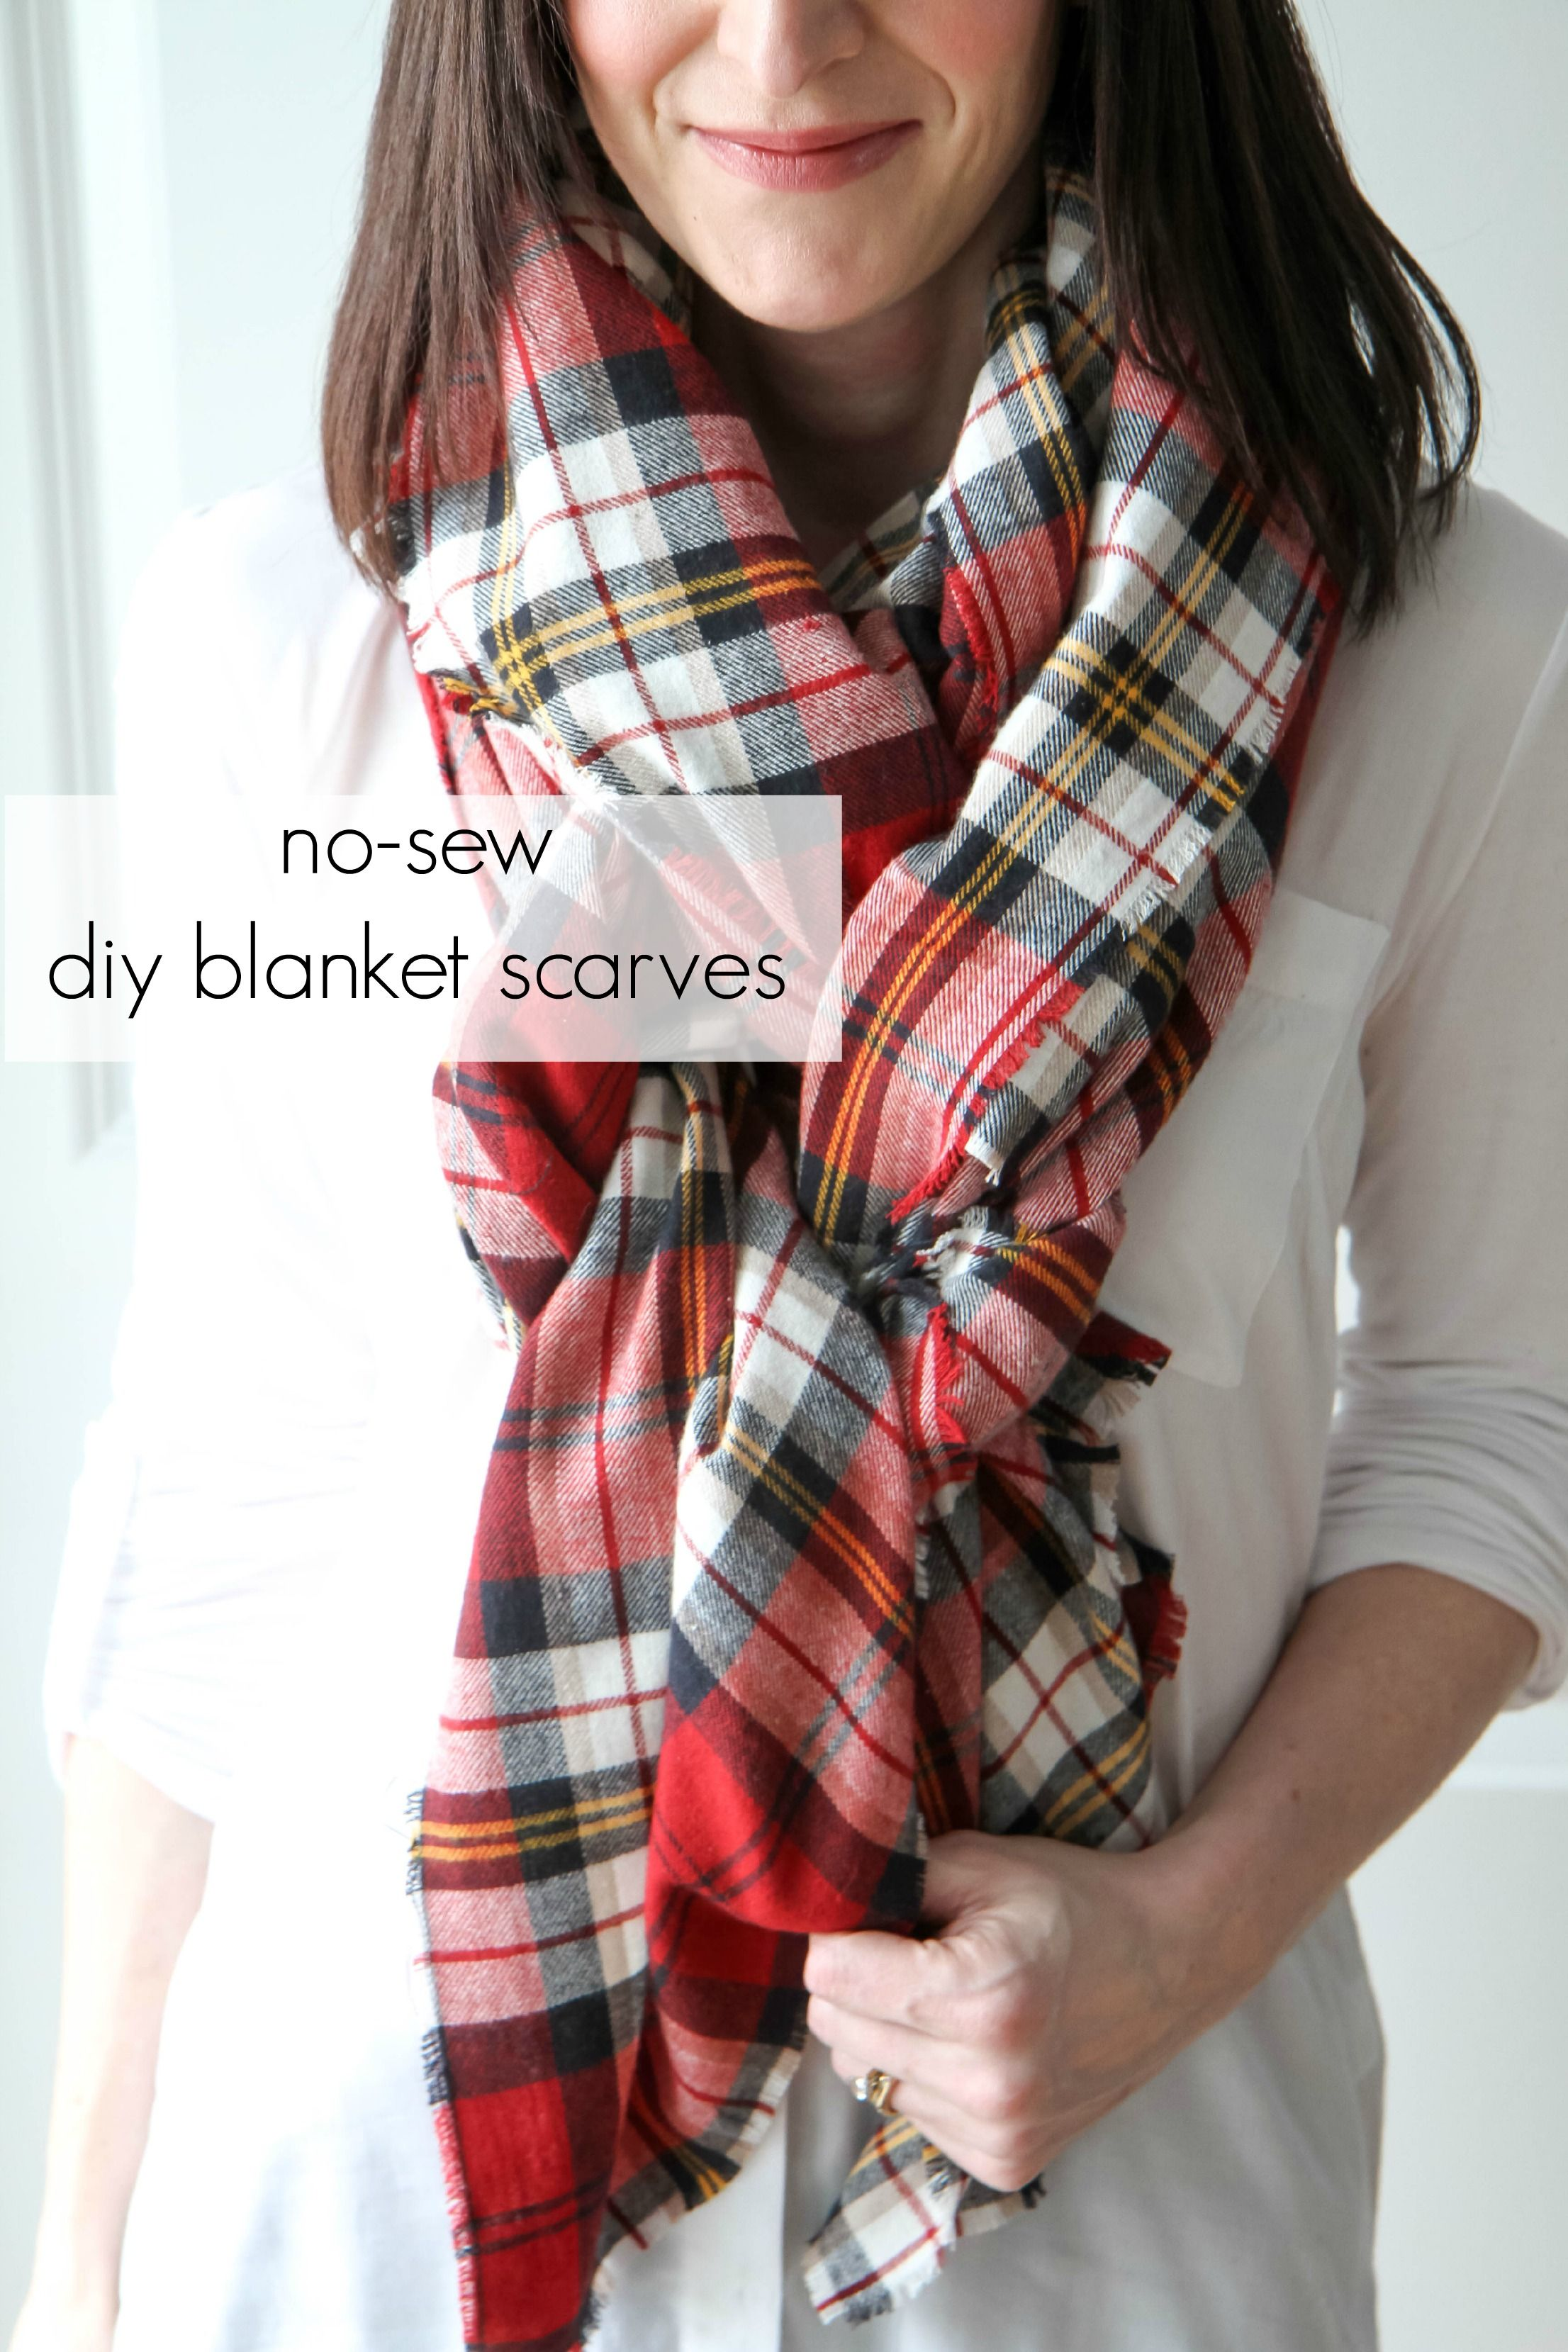 How to Make a Blanket Scarf | DIY Crafts | Pinterest ...